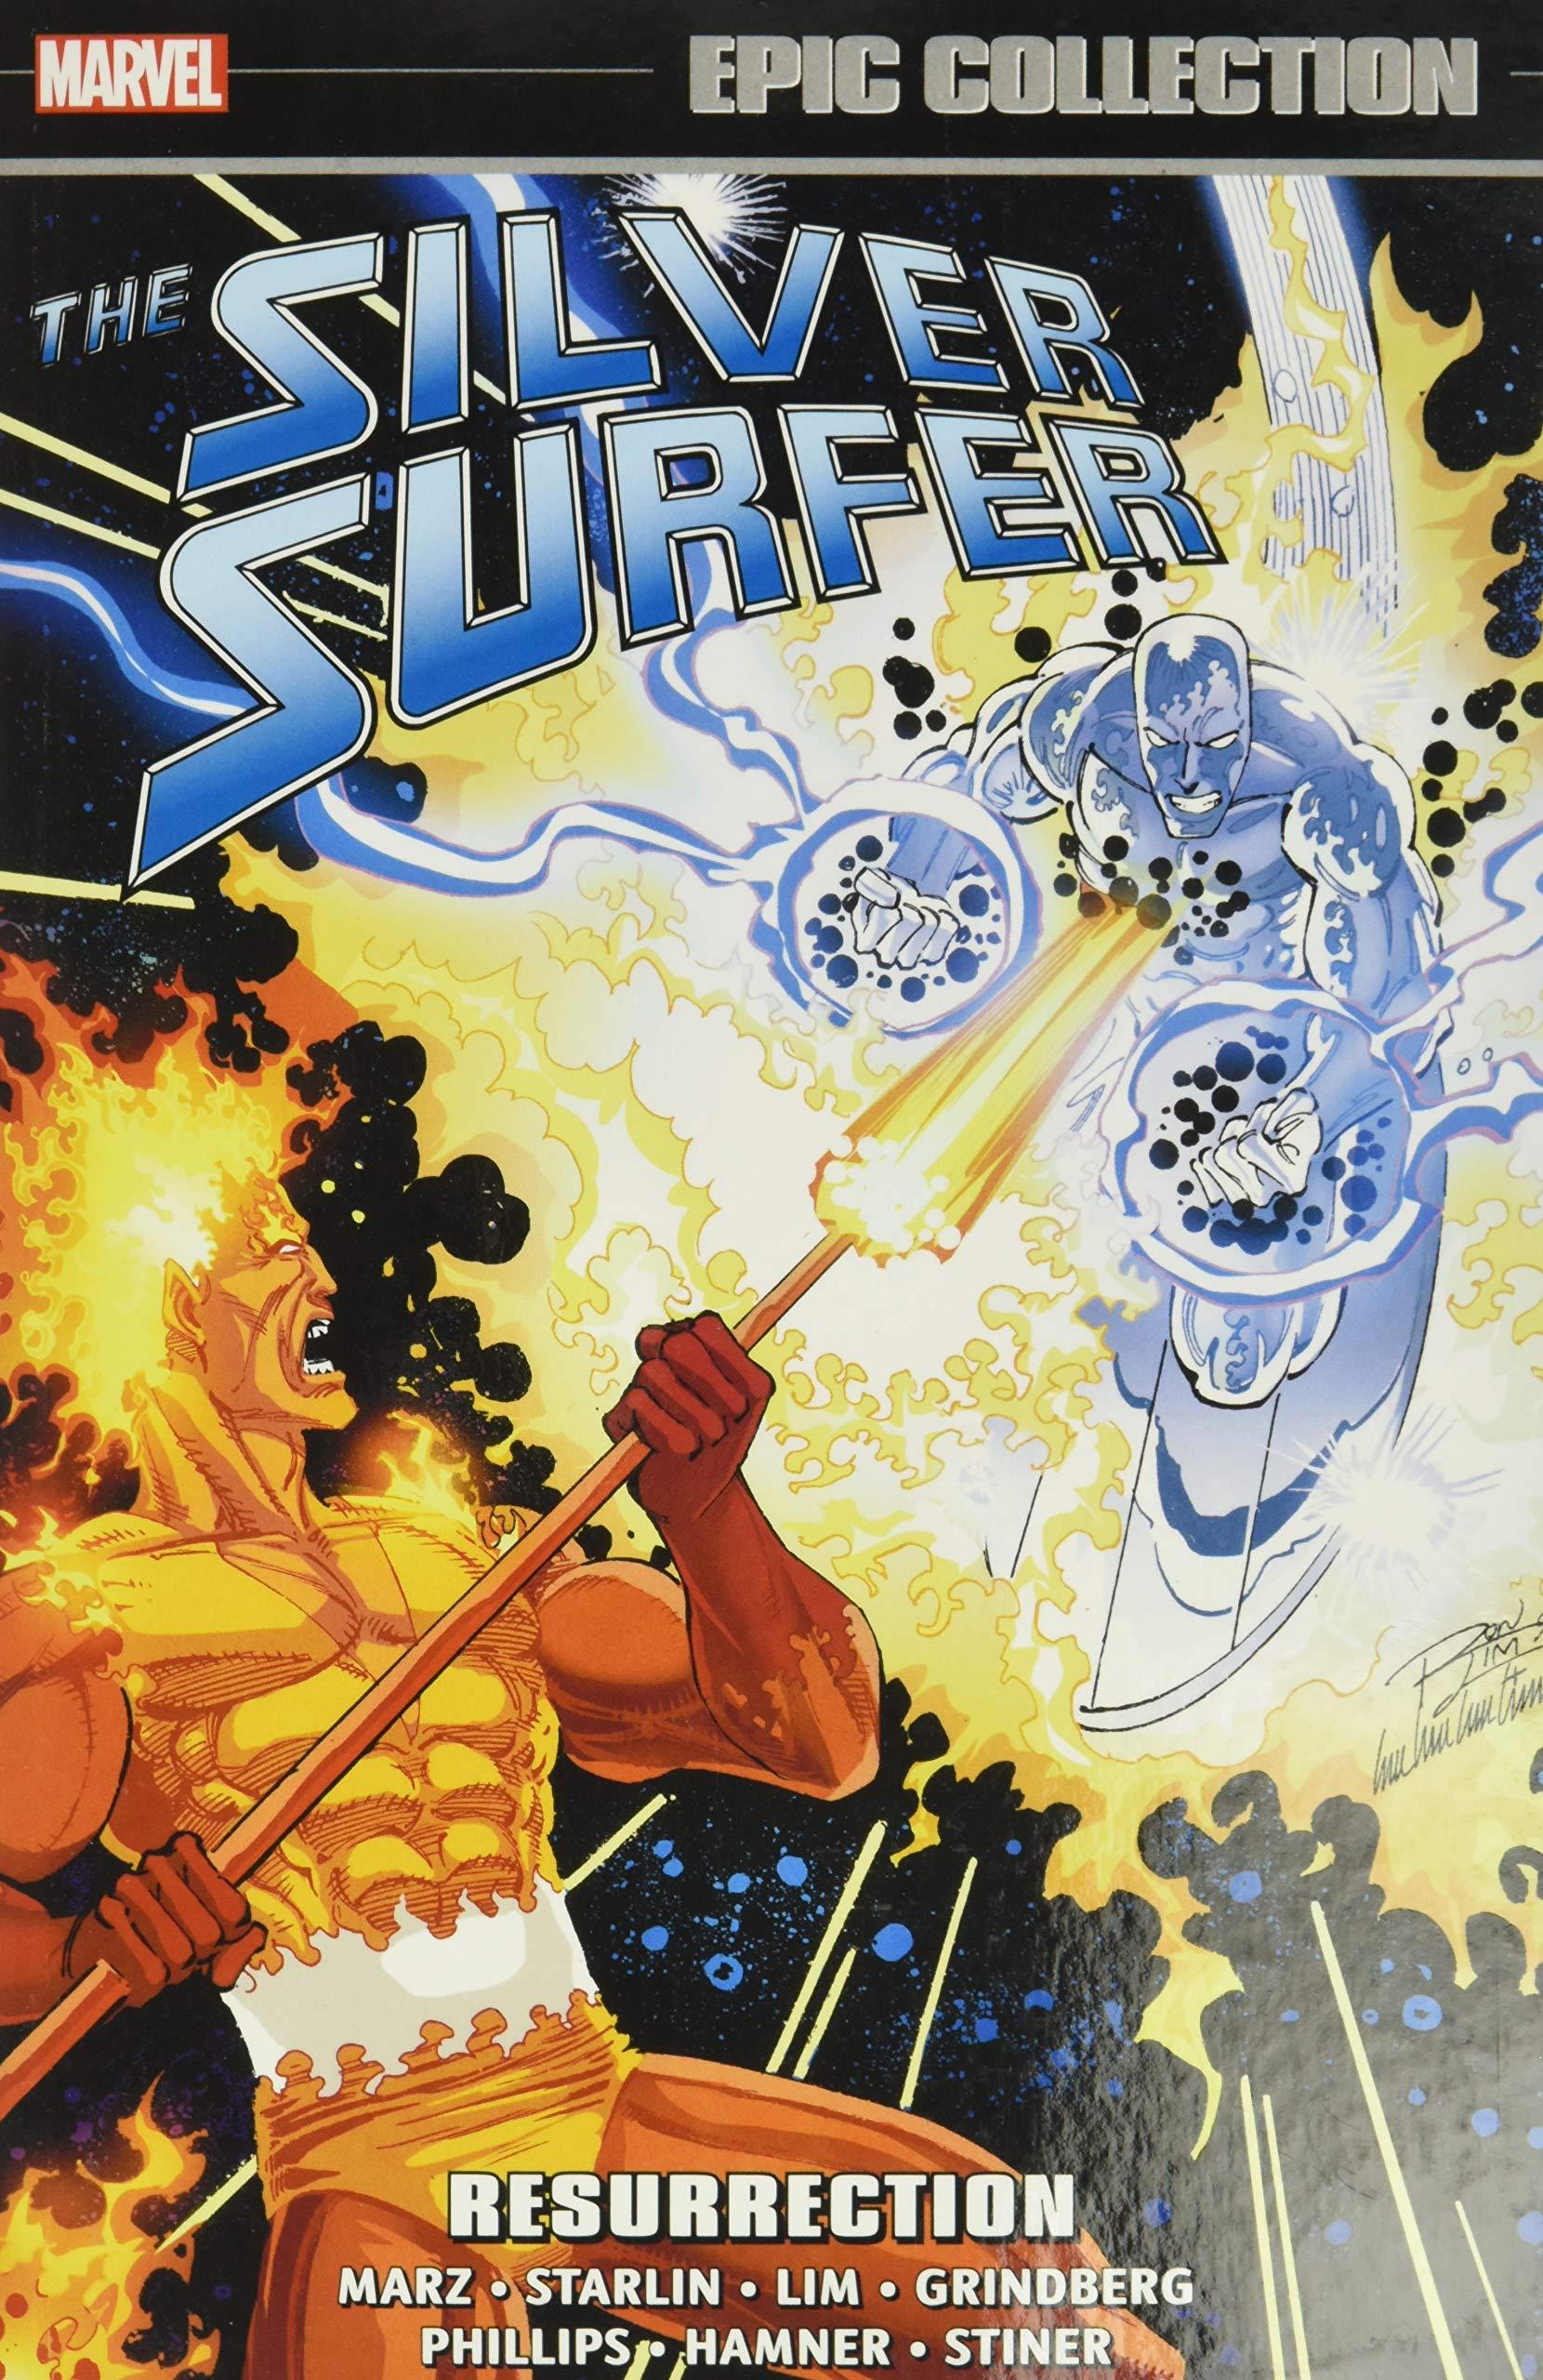 SILVER SURFER WHEN CALLS GALATUS TPB Marvel Comics Epic Collection Volume 1 TP